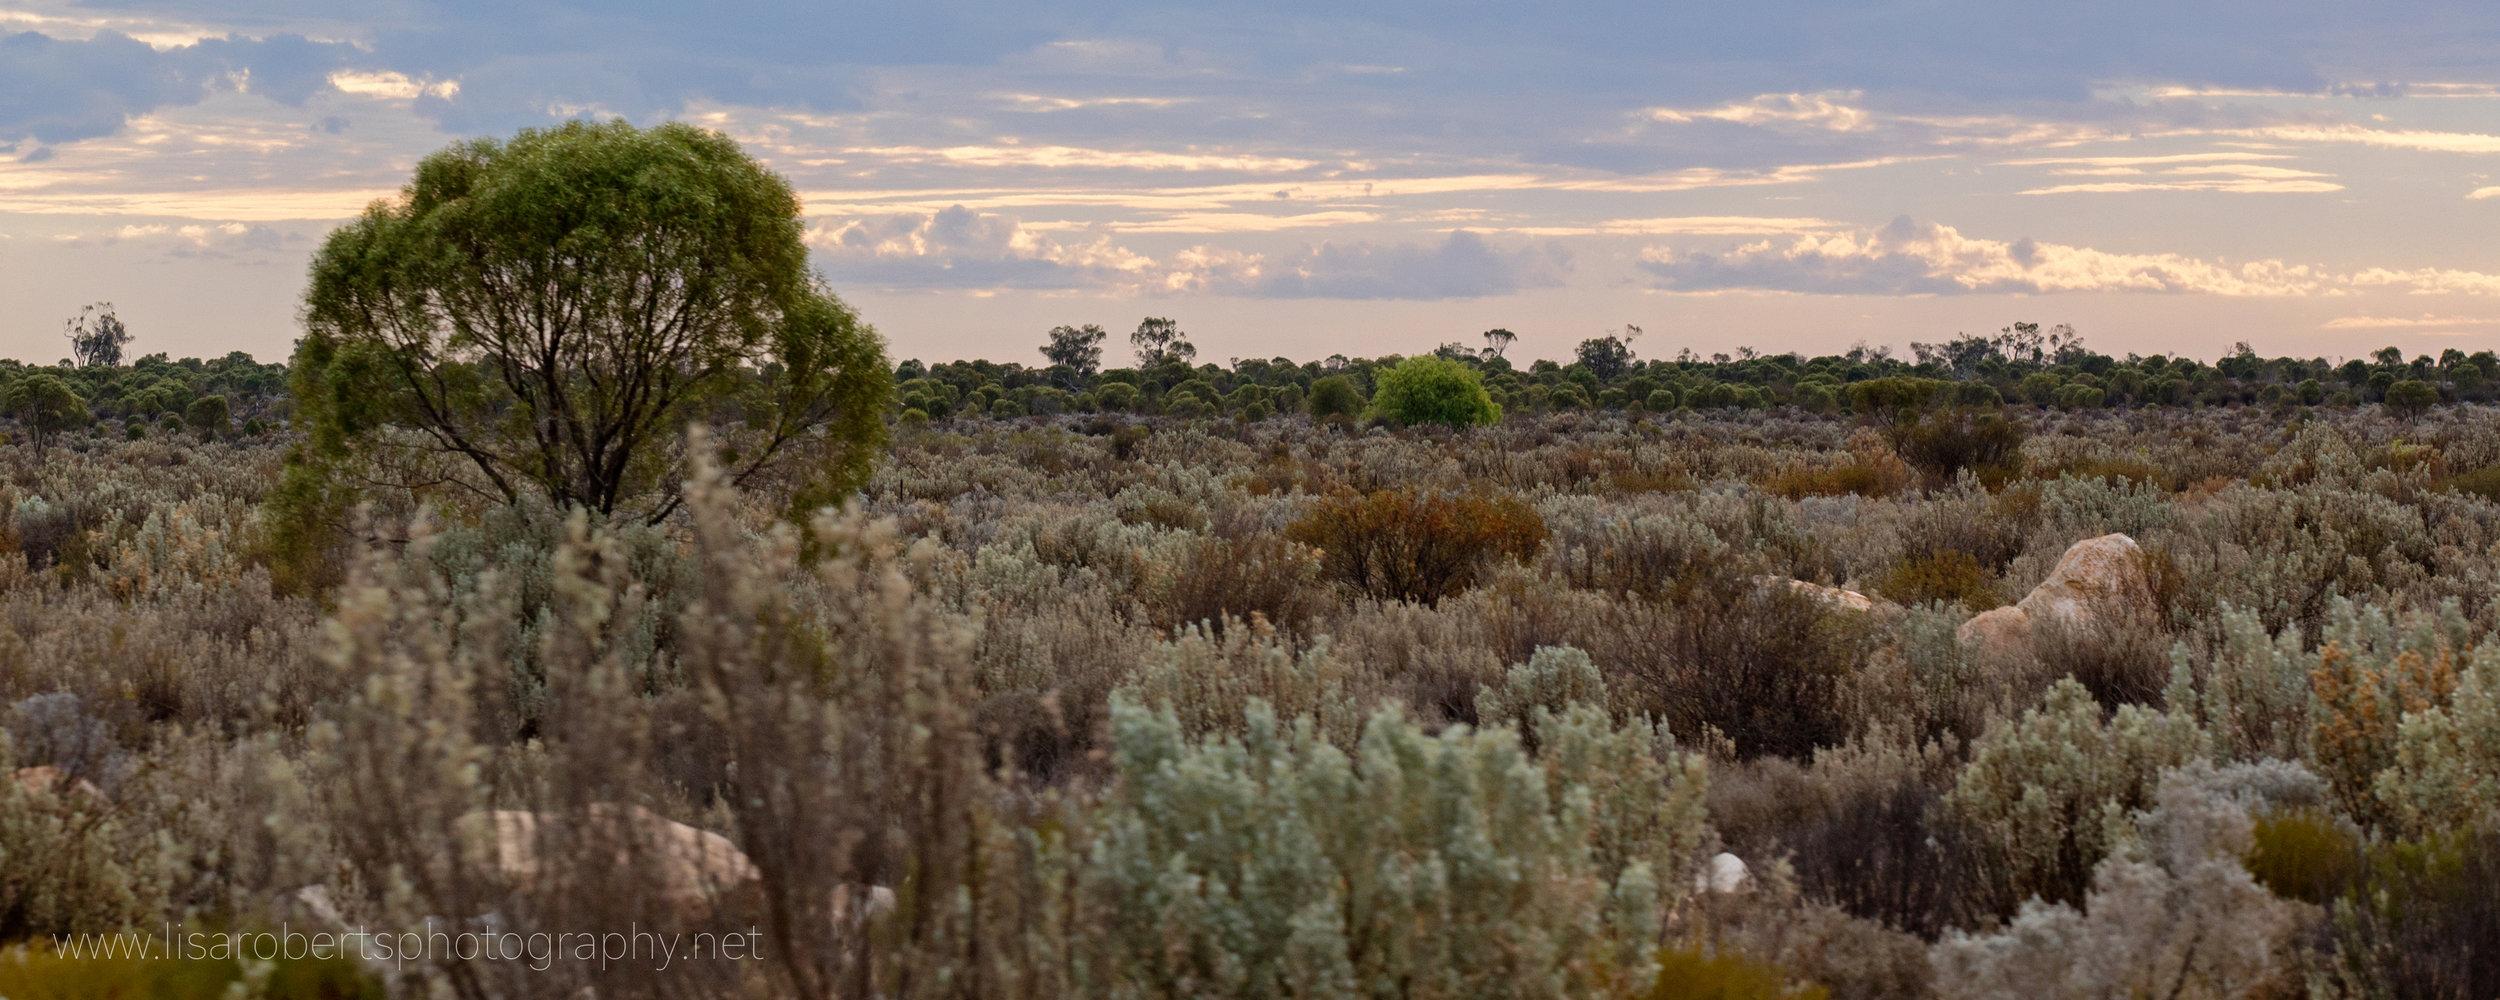 More bush! Western Australia